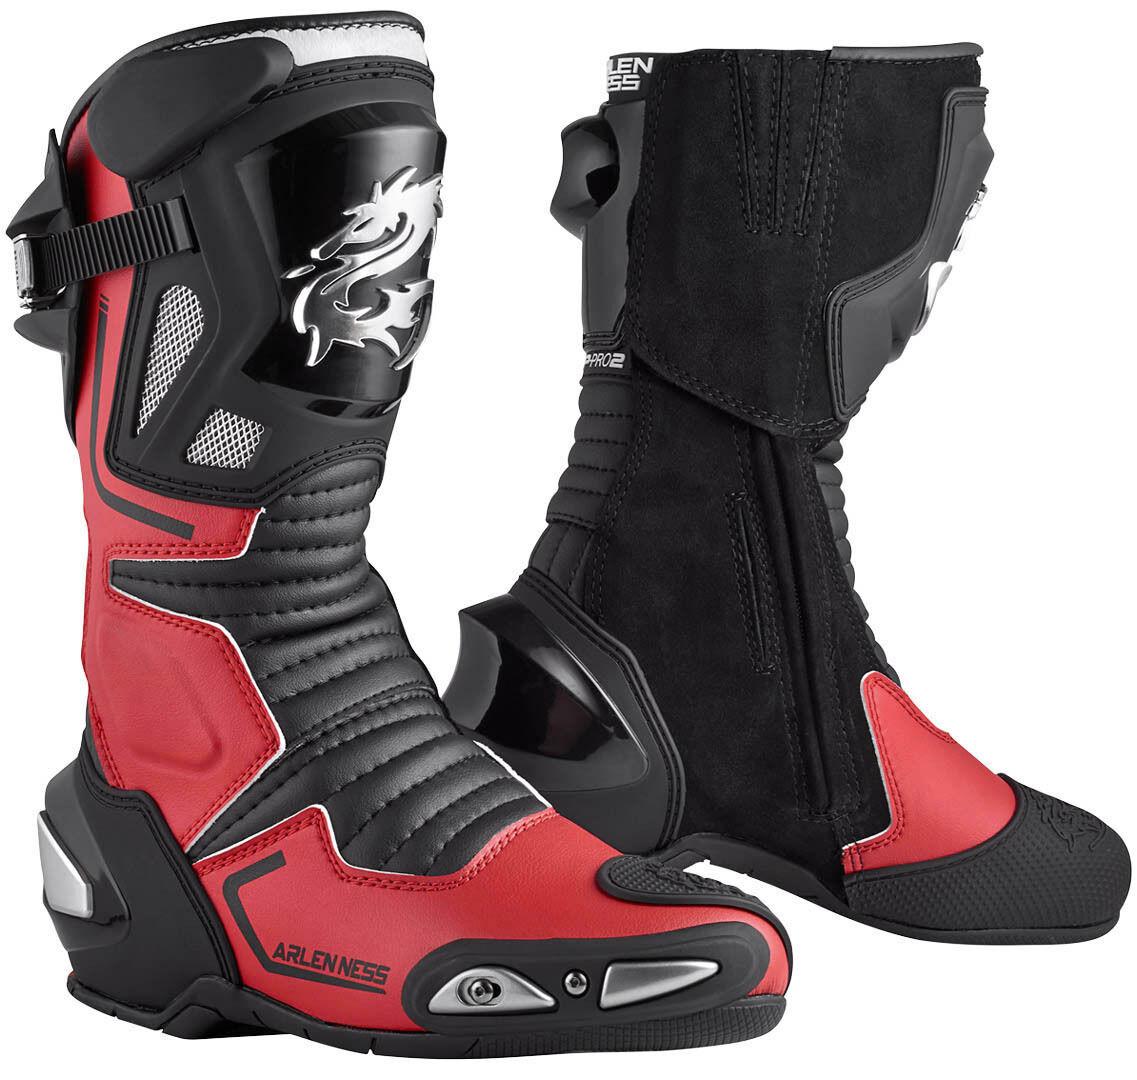 Arlen Ness Sugello Motorcycle Boots Black Red 46